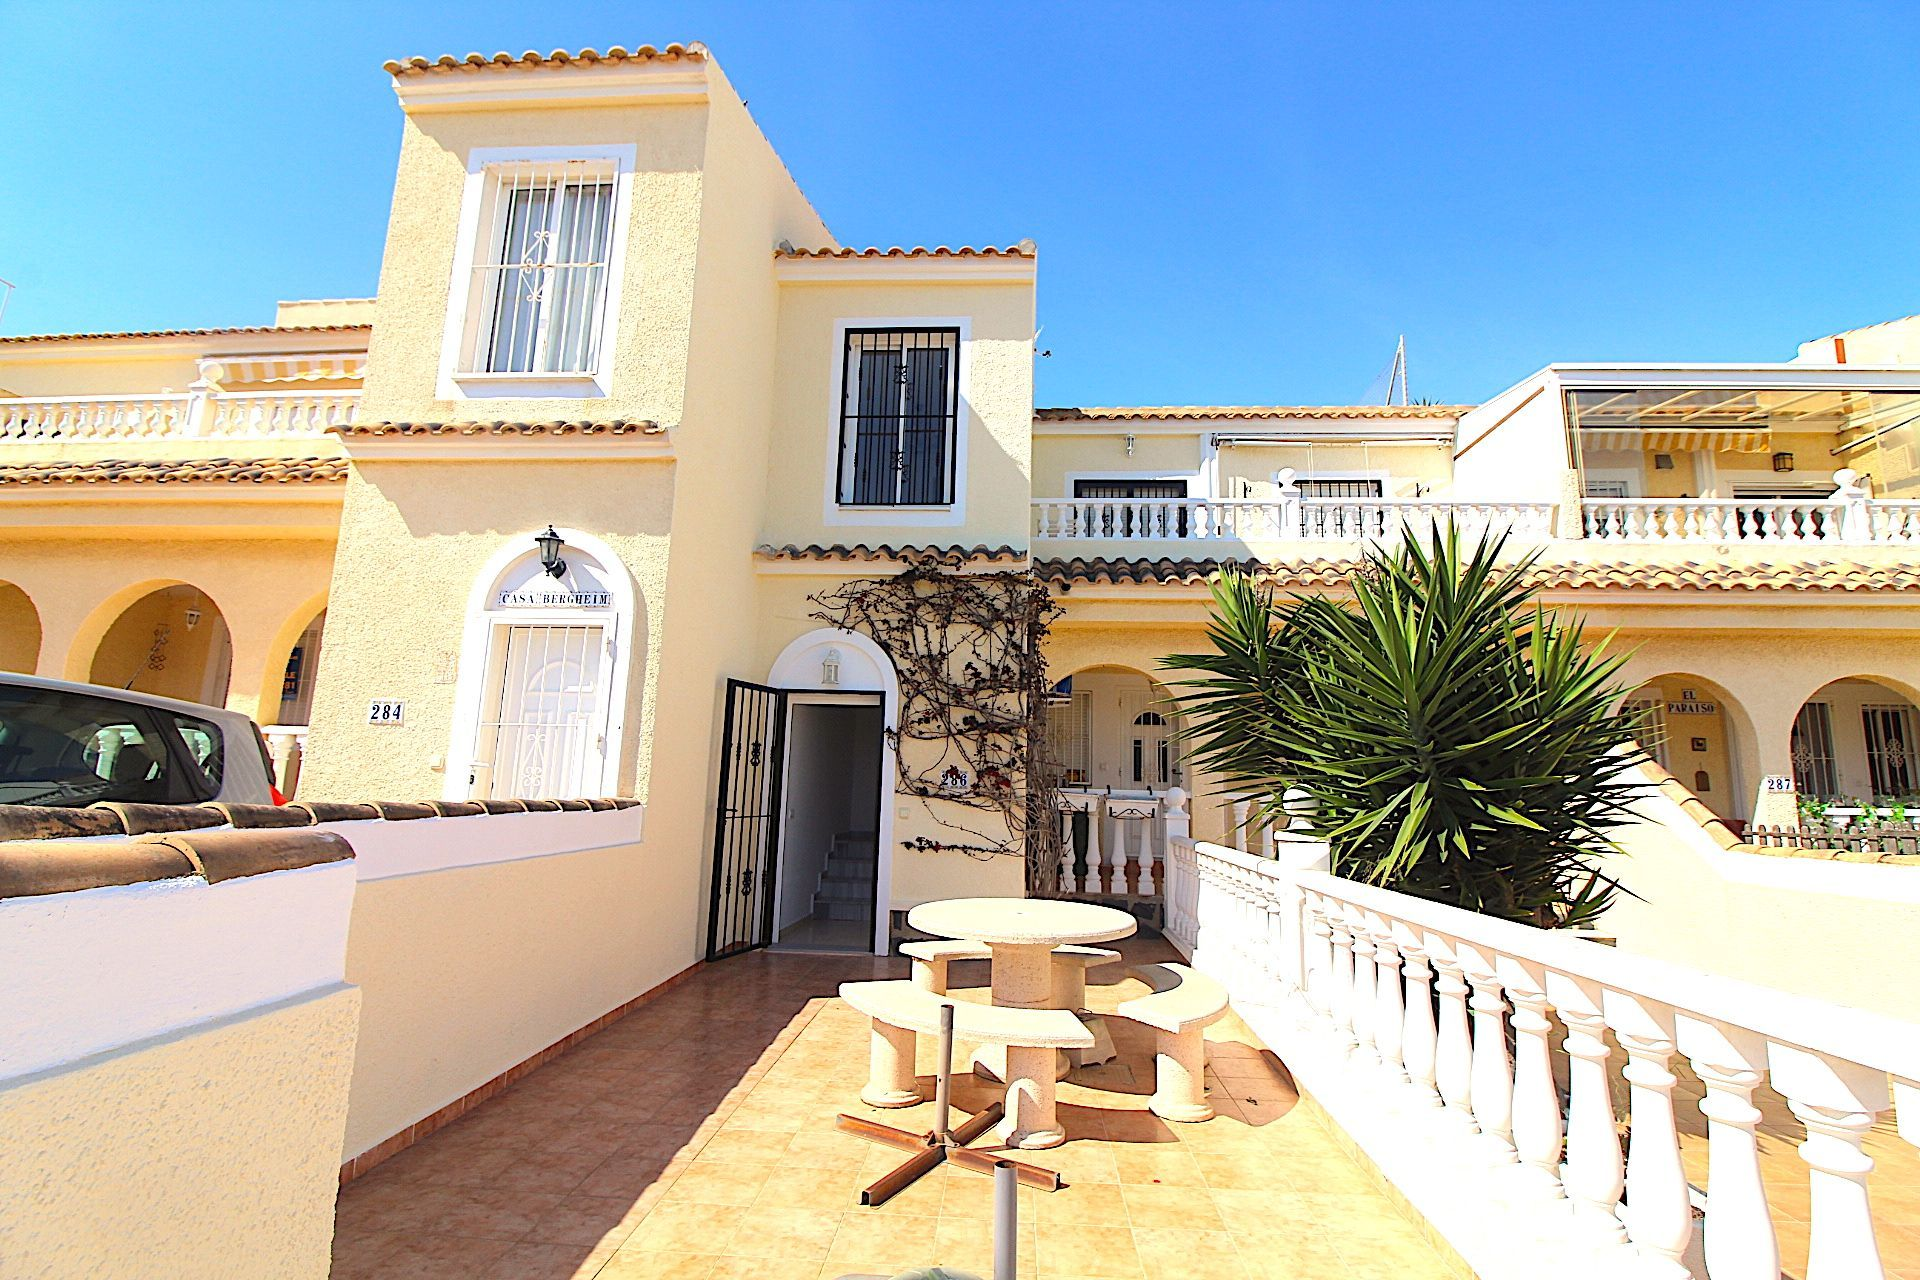 Apartment in Gran Alacant, Monte y Mar Zona Media Gran Alacant, for sale